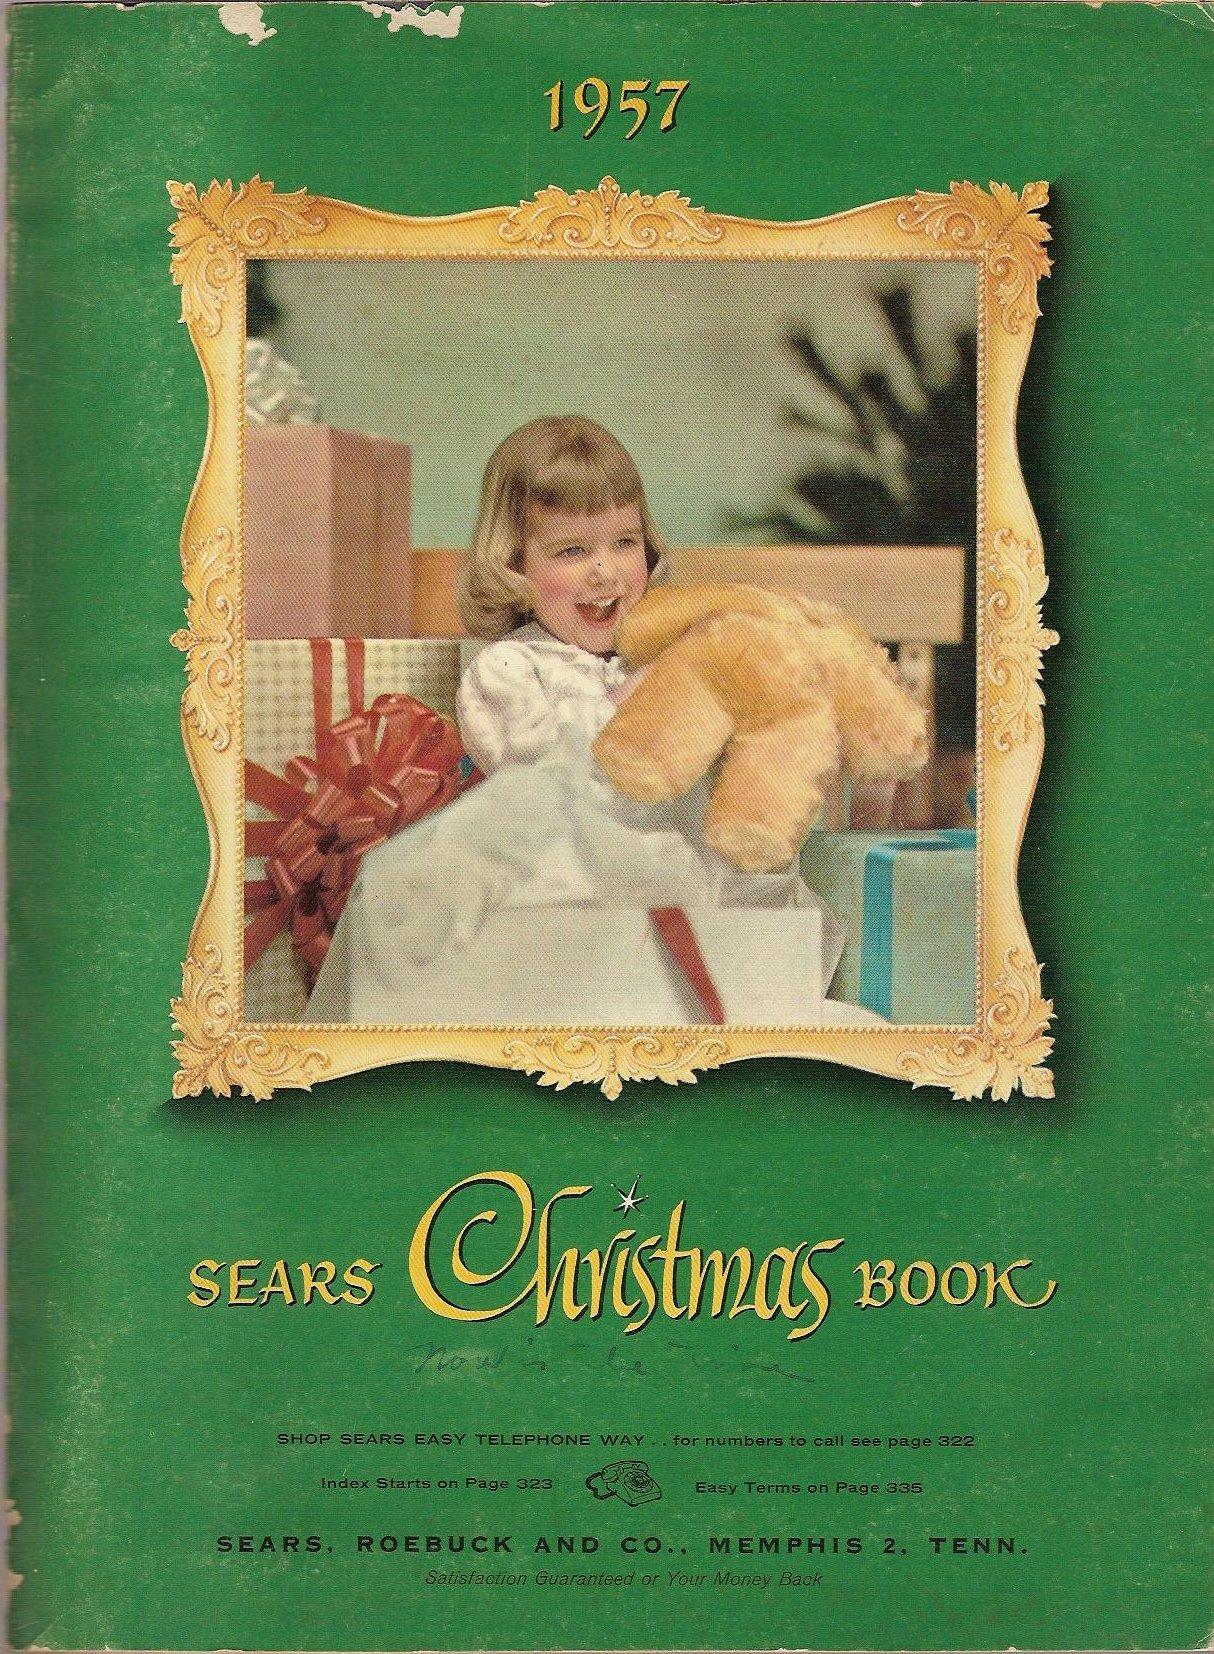 Sears Christmas Photos.1957 Sears Christmas Book Roebuck And Company Sears Amazon